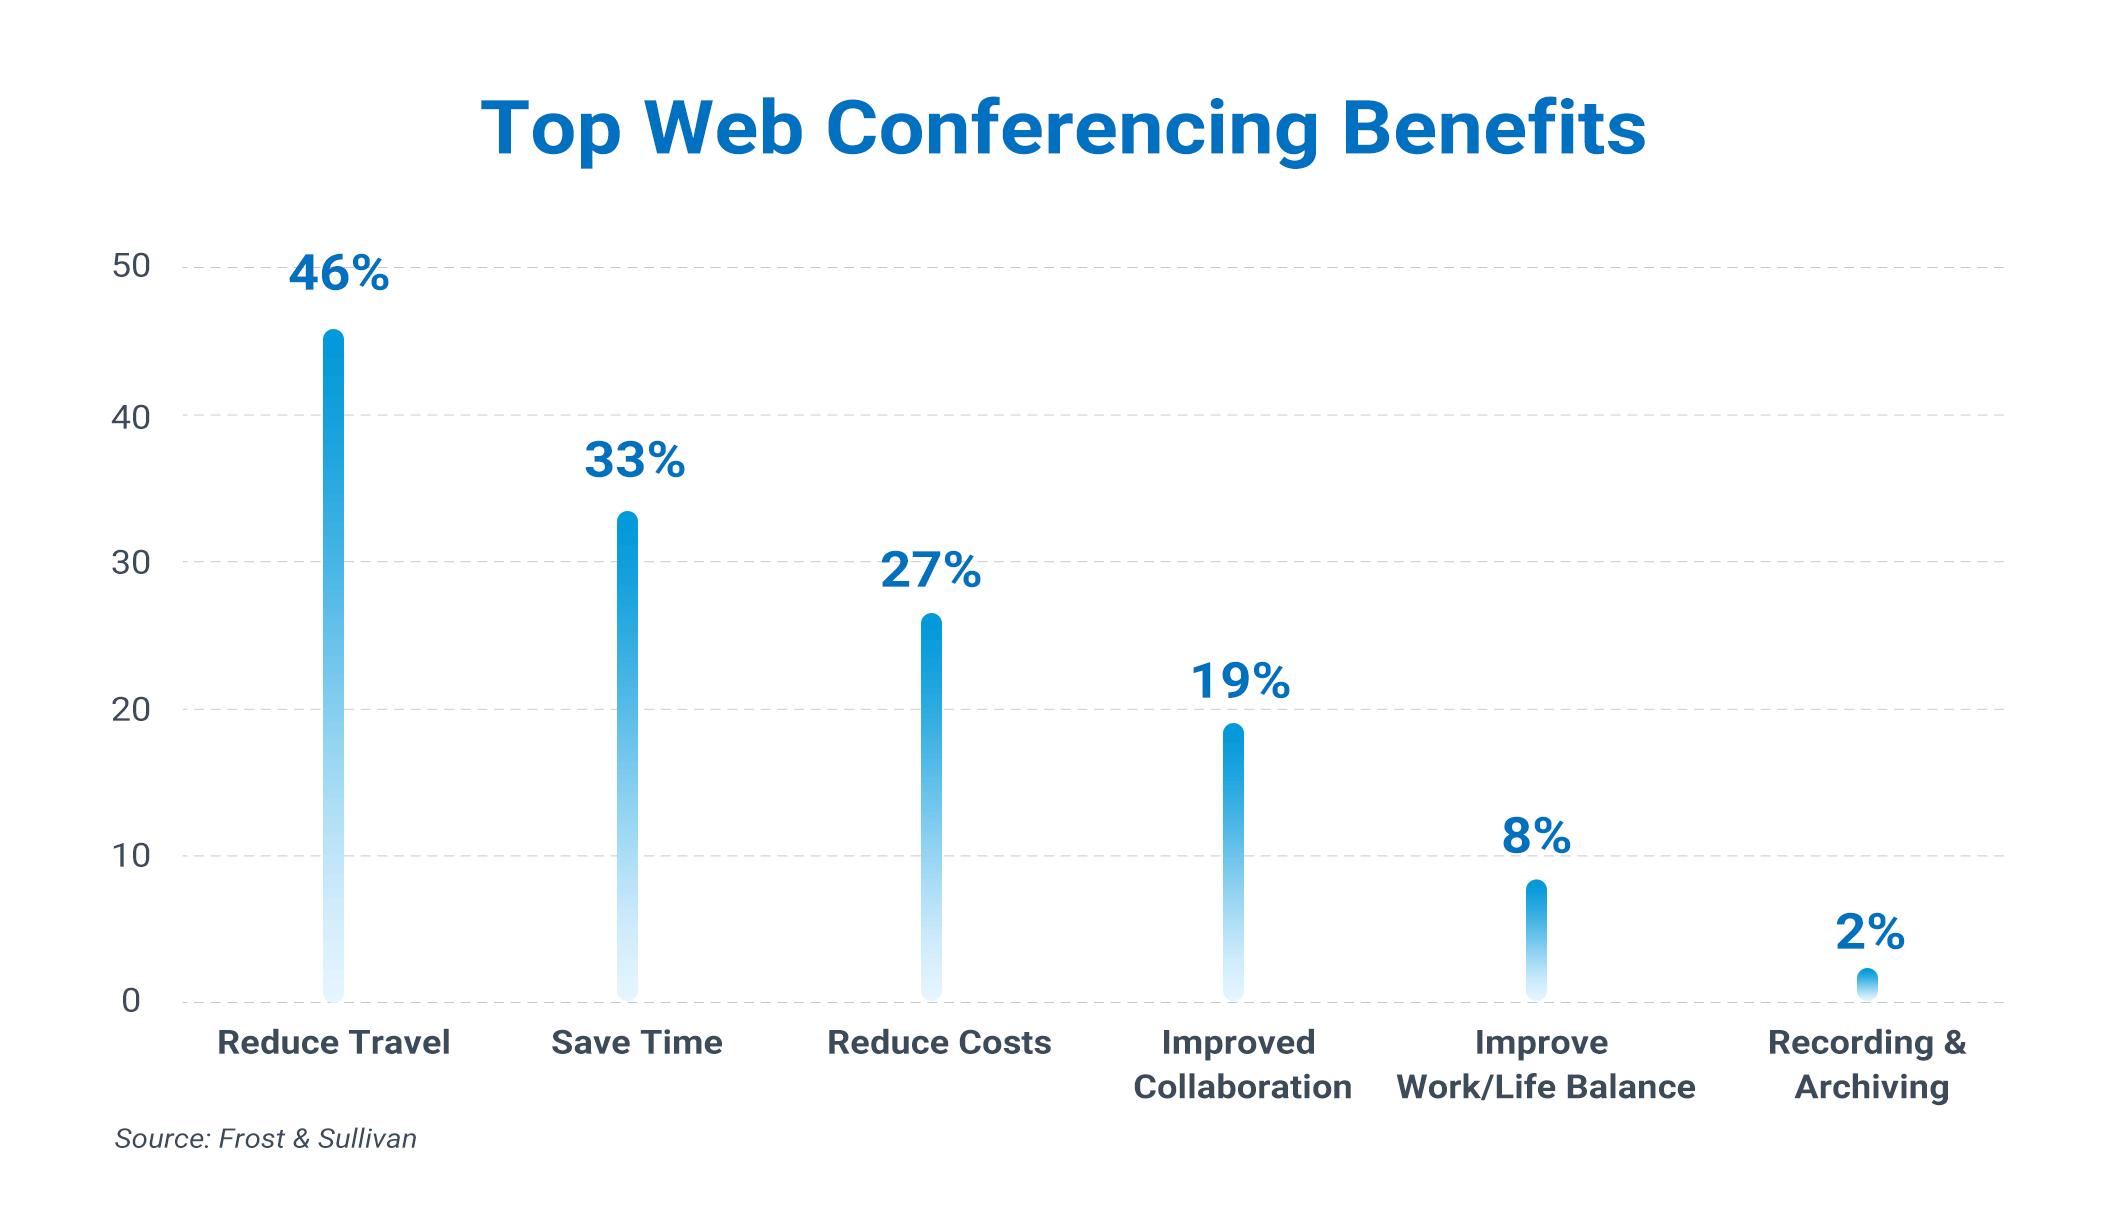 Top Web Conferencing Benefits